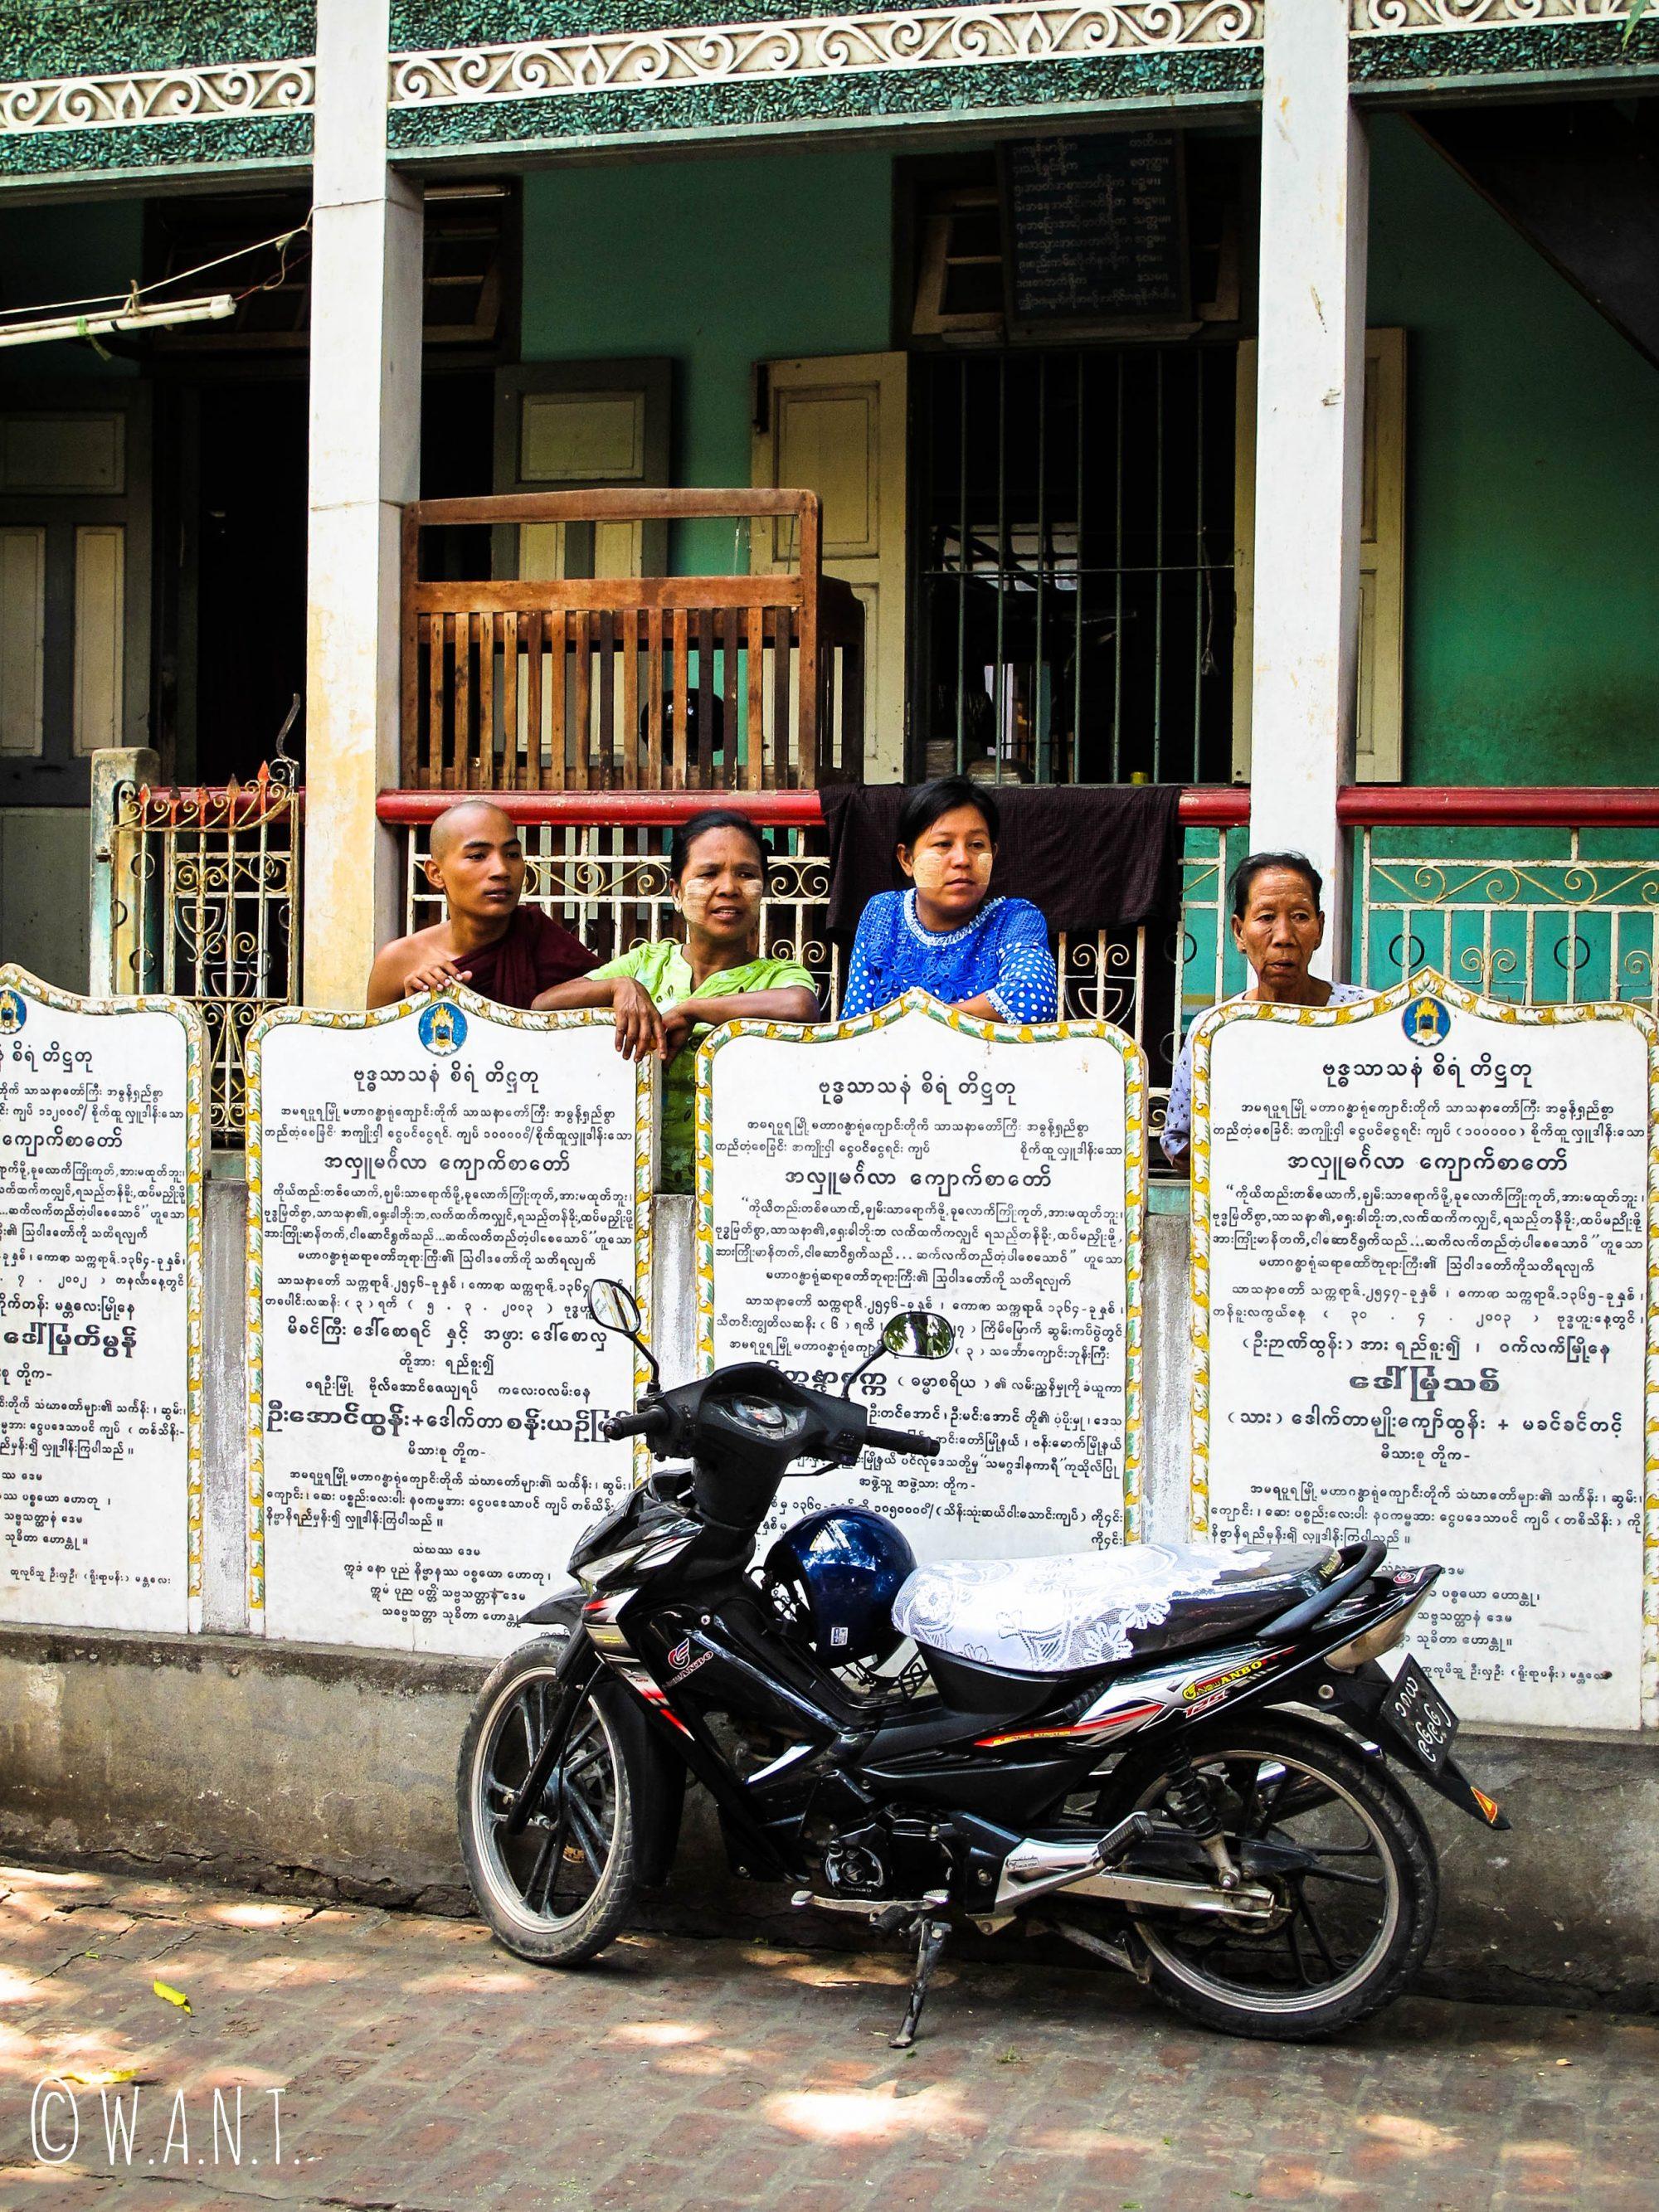 Spectateurs autochtones au monastère Maha Ganayon Kyaung